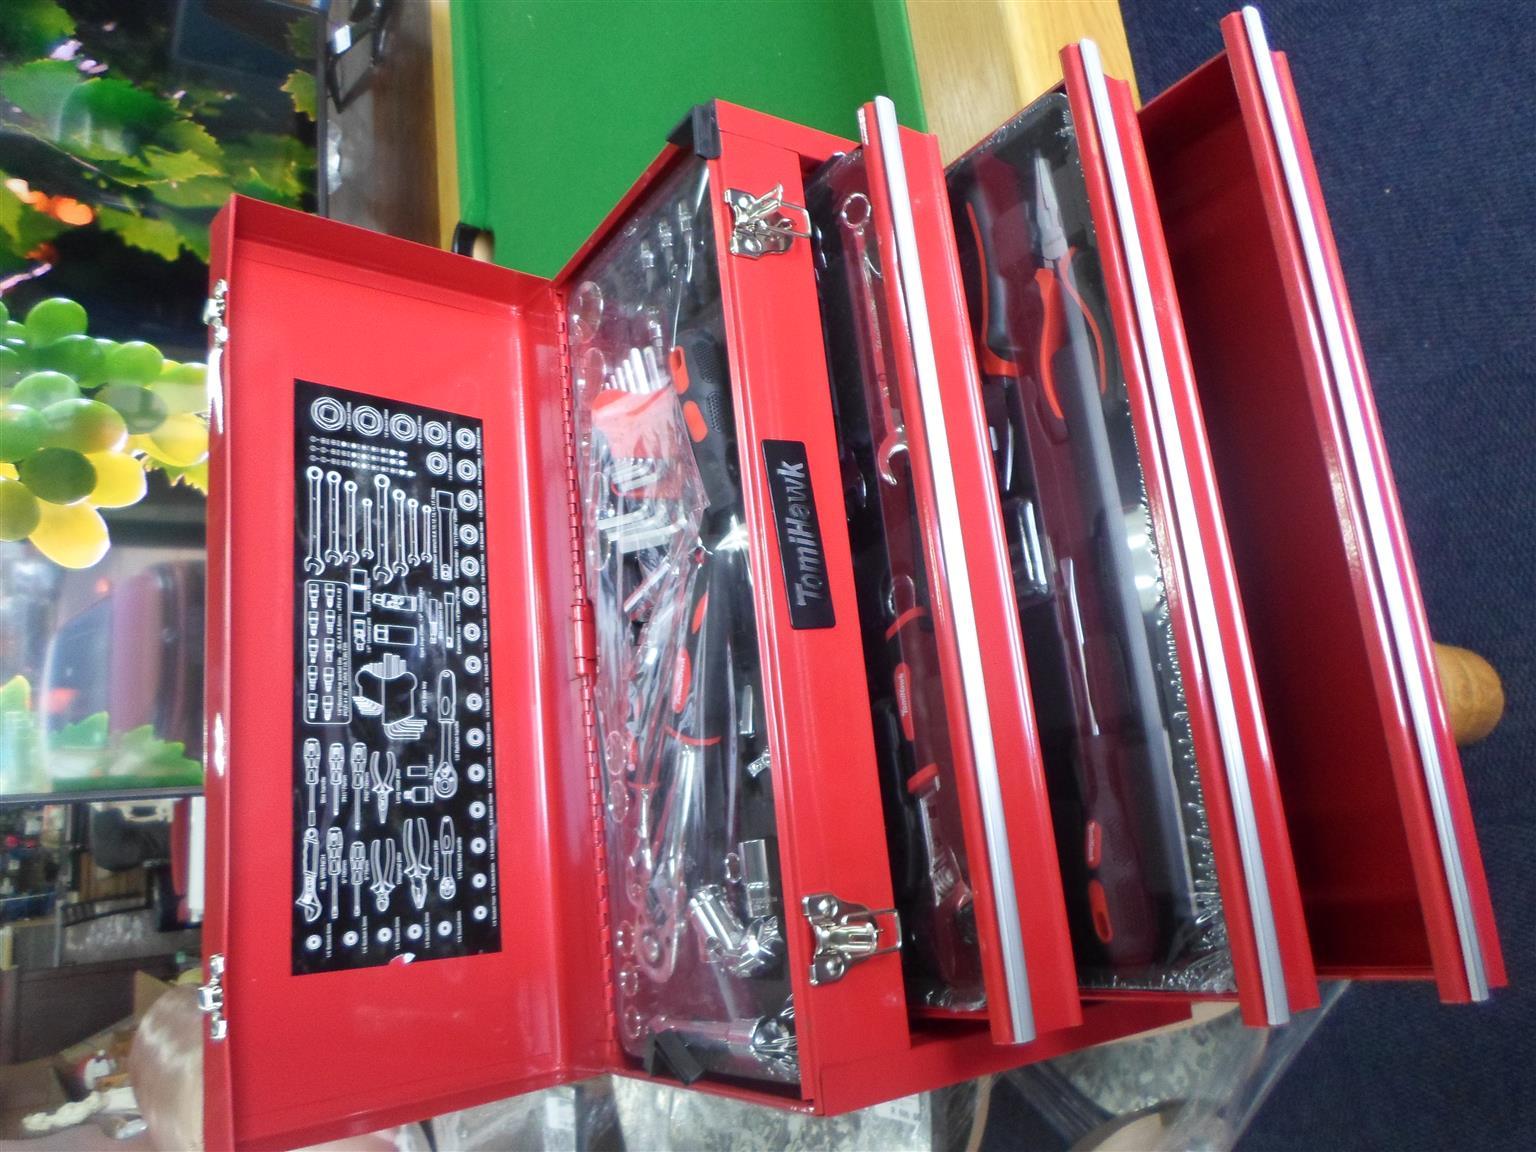 TomiHawk Toolbox + Tools